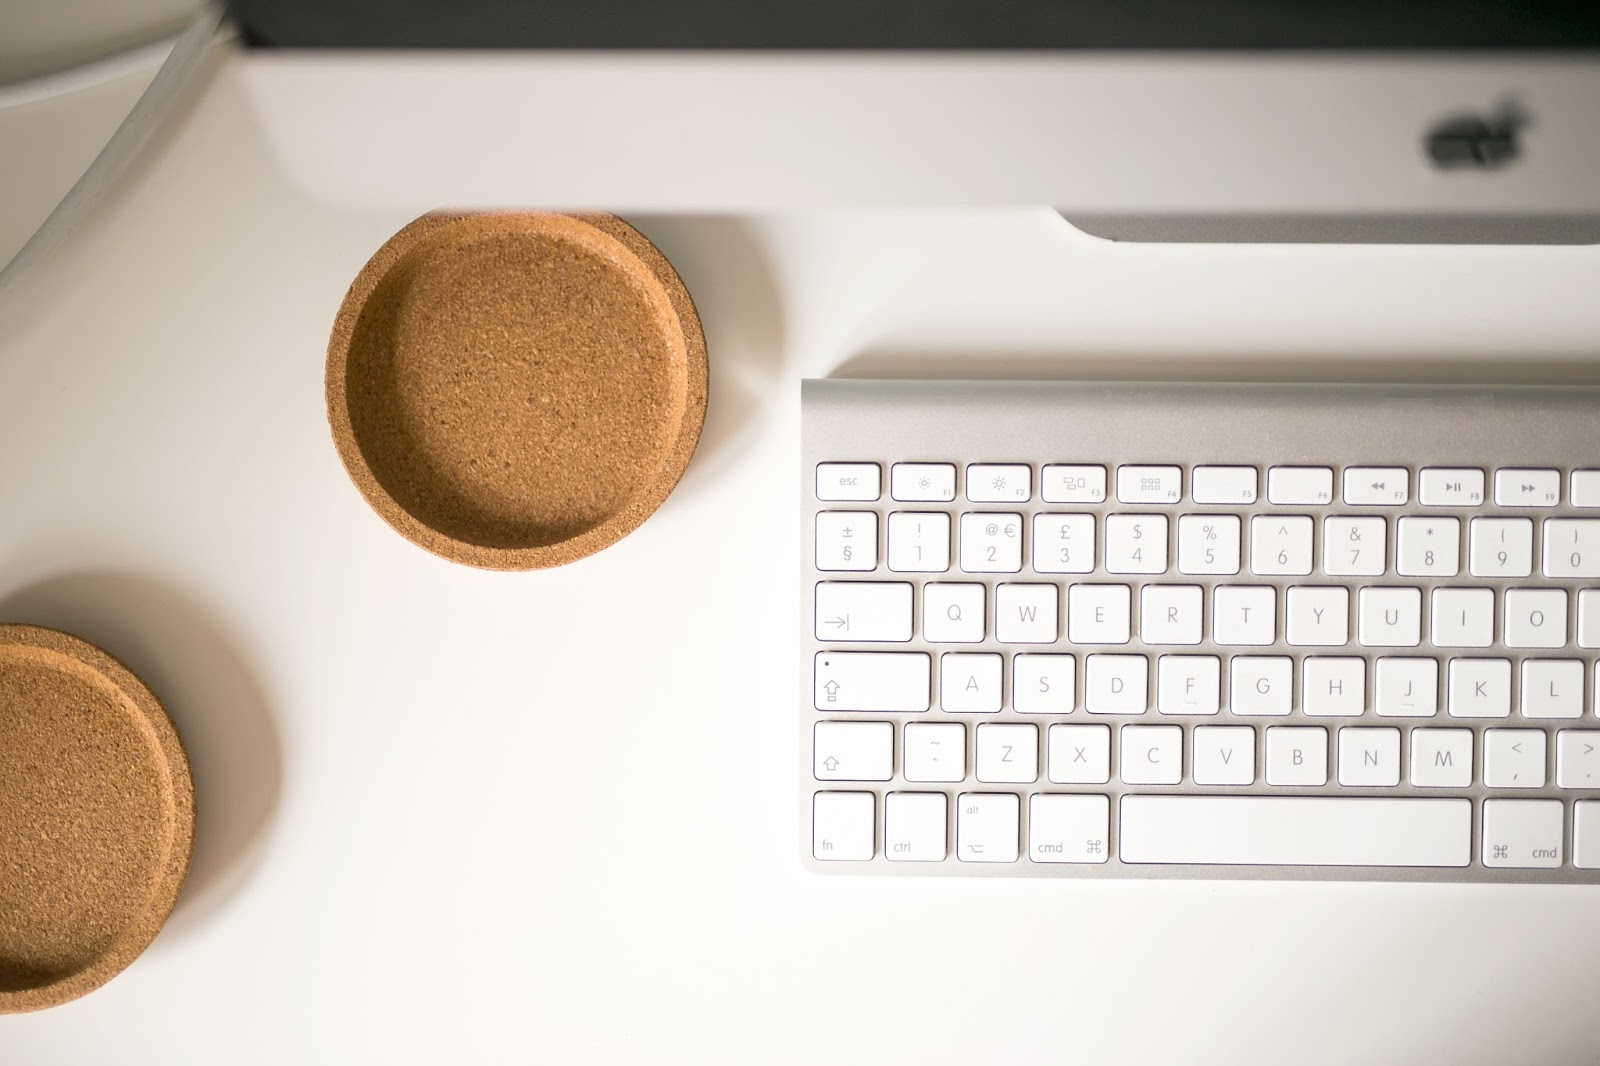 Desk, IKEA Coasters, IKEA Alex Desk, White Desk, Apple Keyboard, iMac, Katie Writes Blog, Katie Writes,